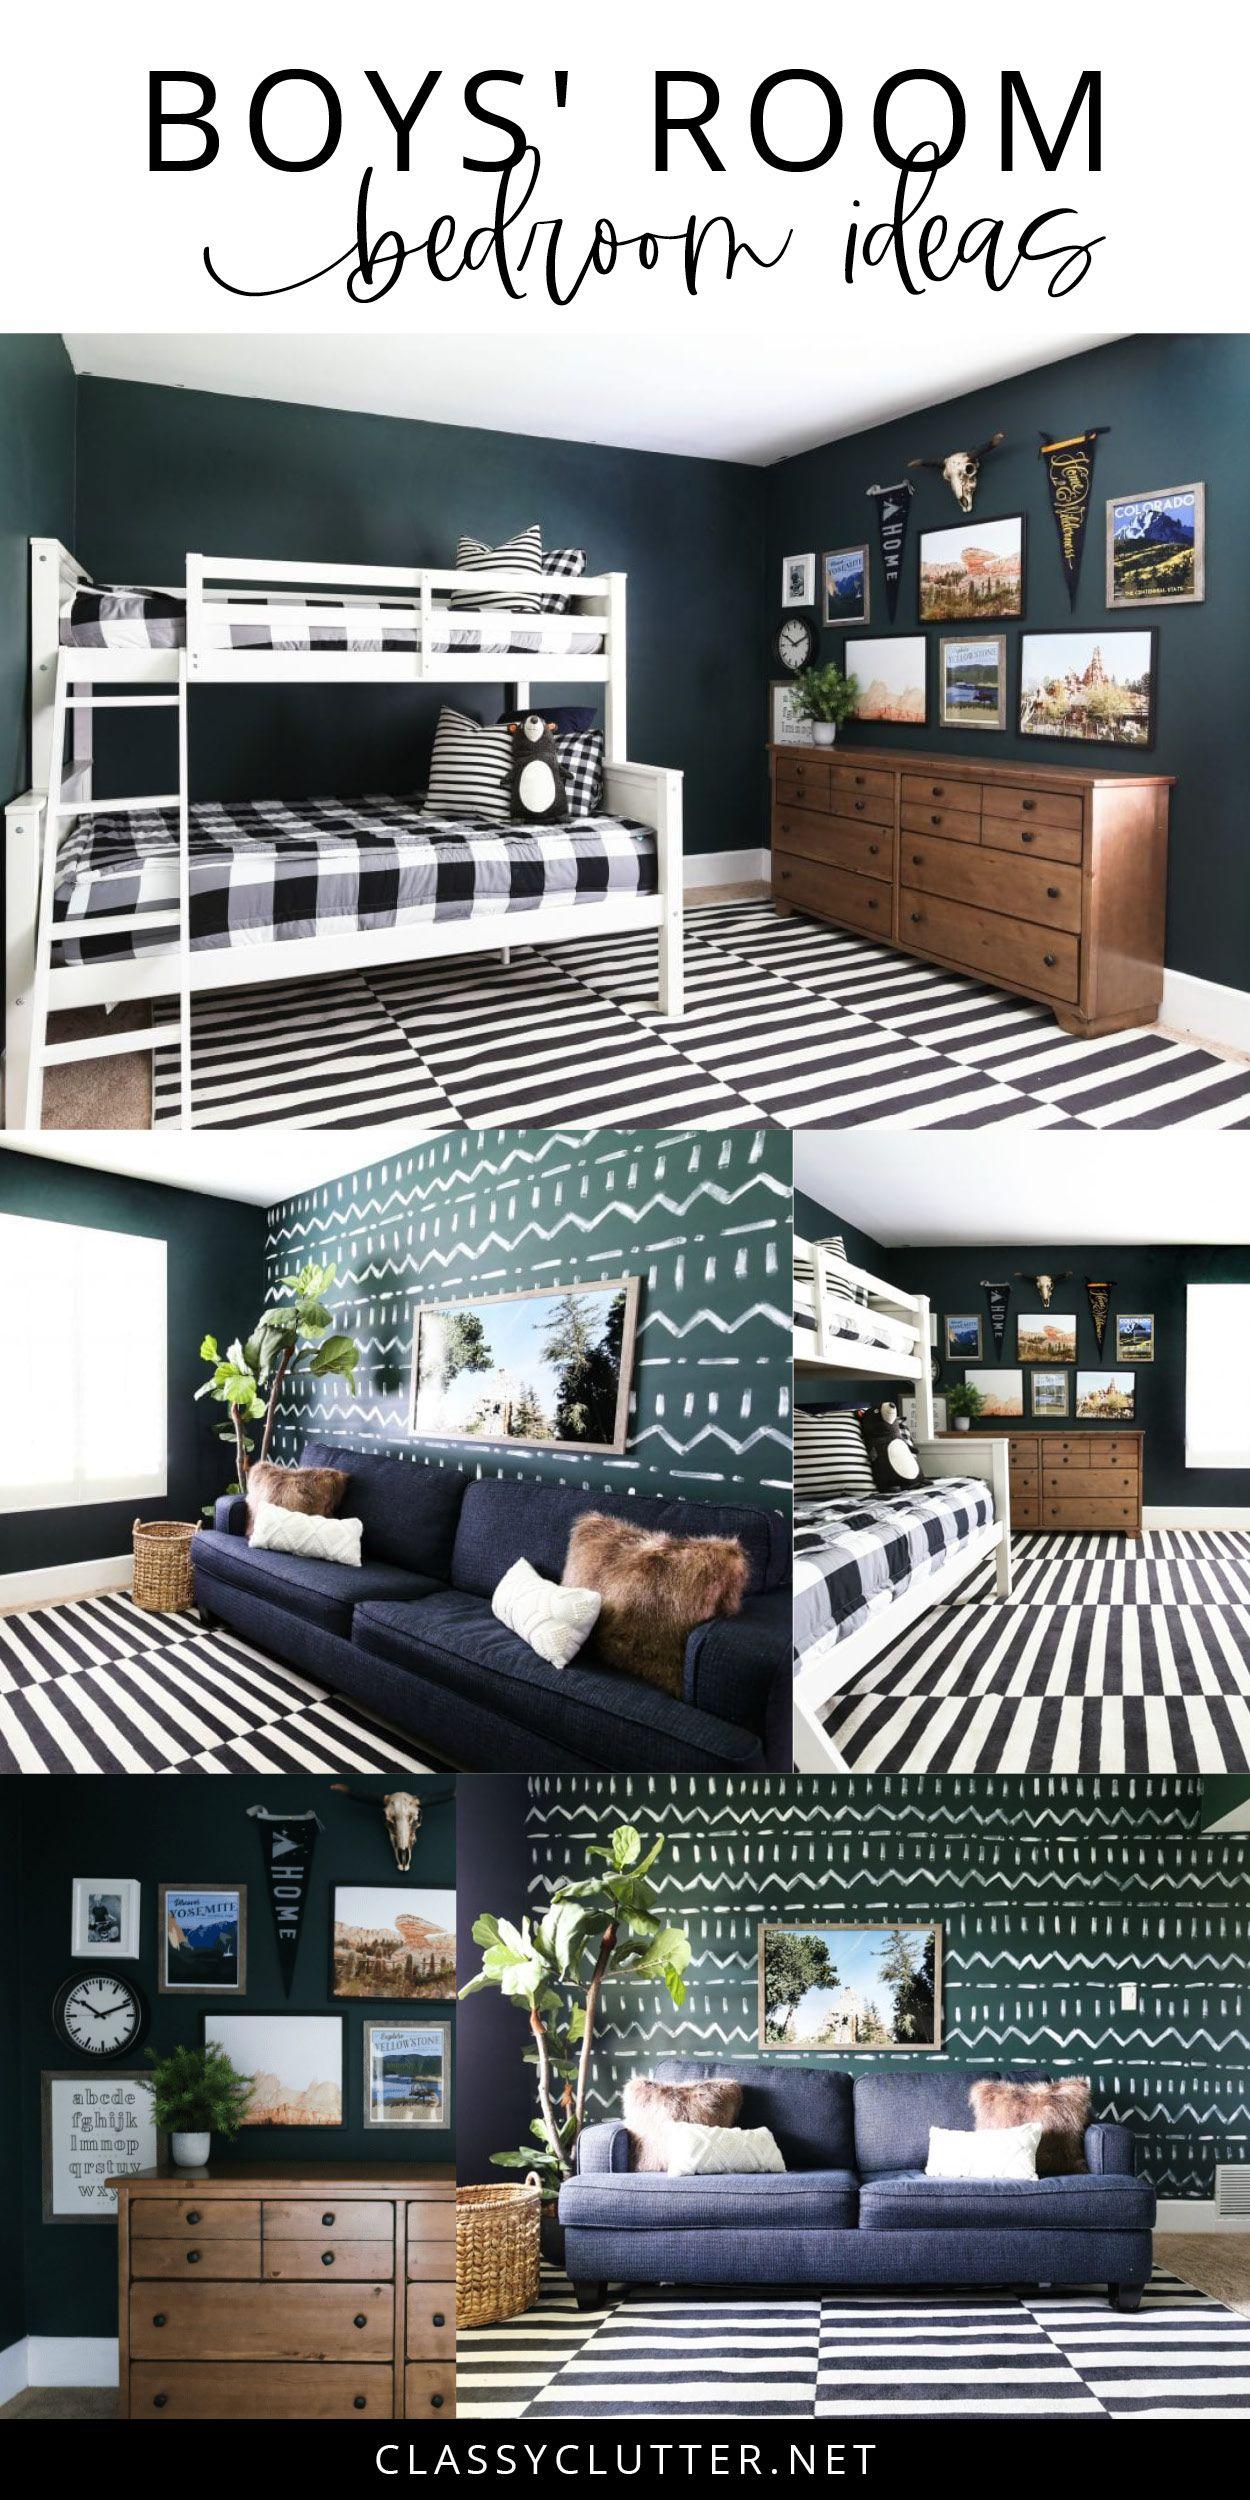 Boys' Room Bedroom Ideas